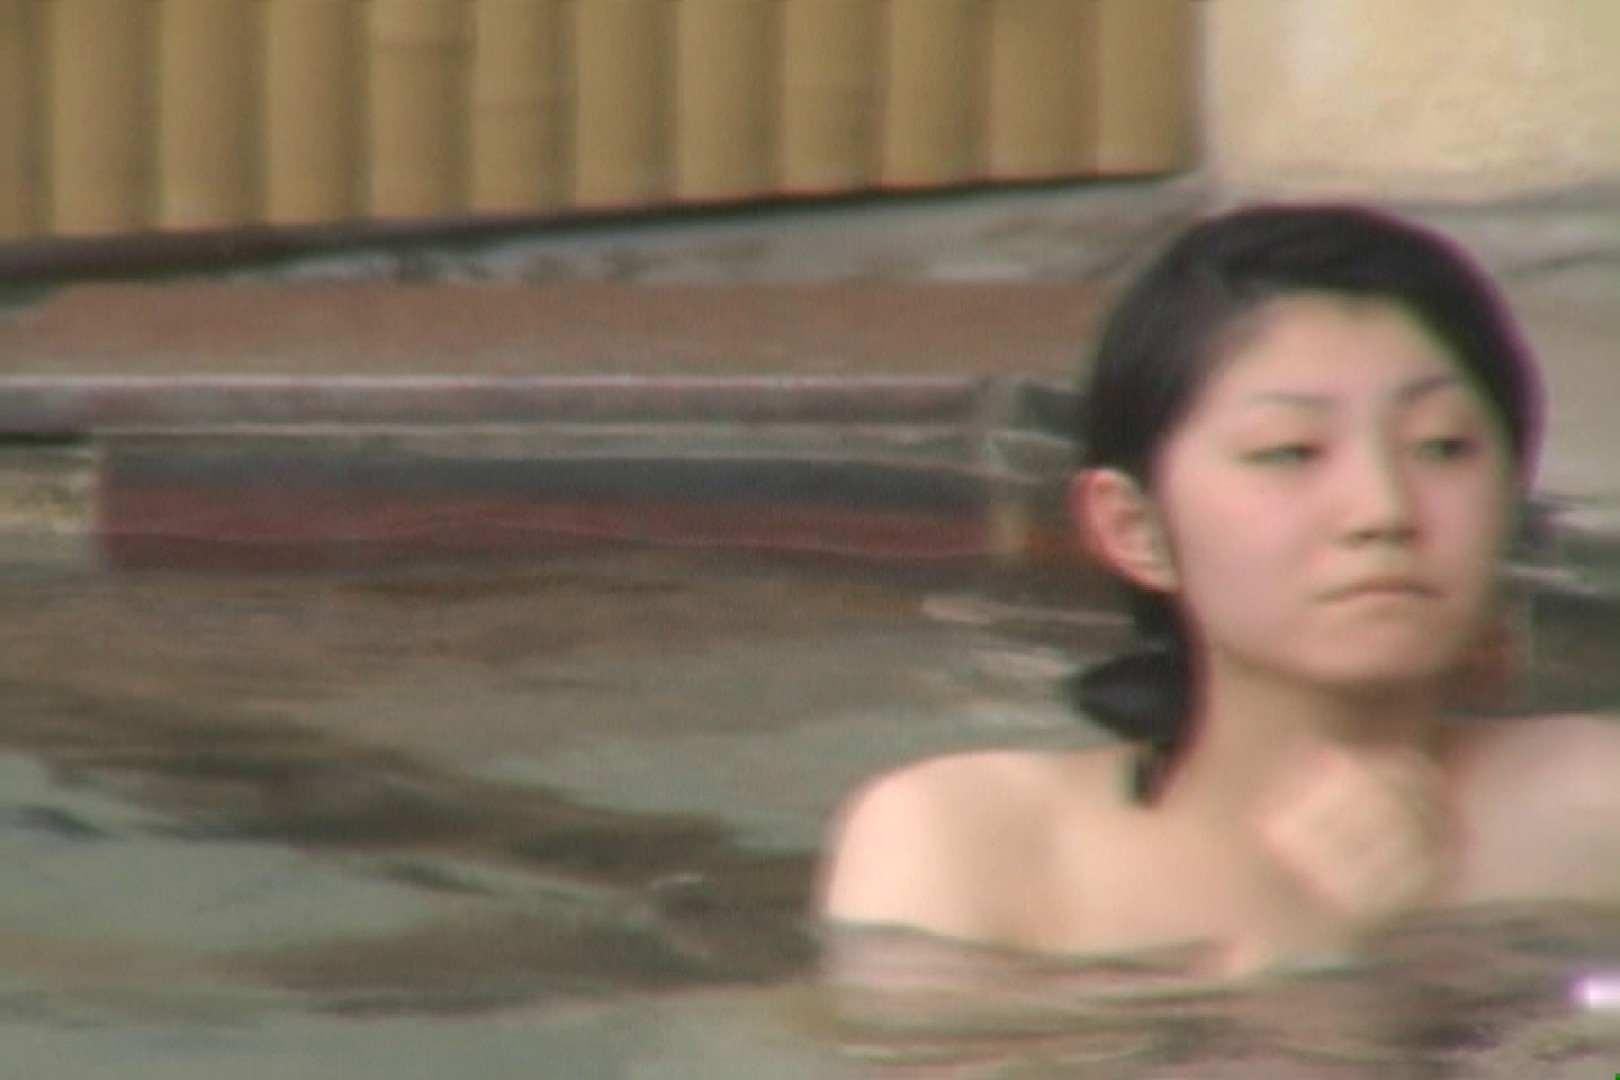 Aquaな露天風呂Vol.579 盗撮 | HなOL  53pic 8